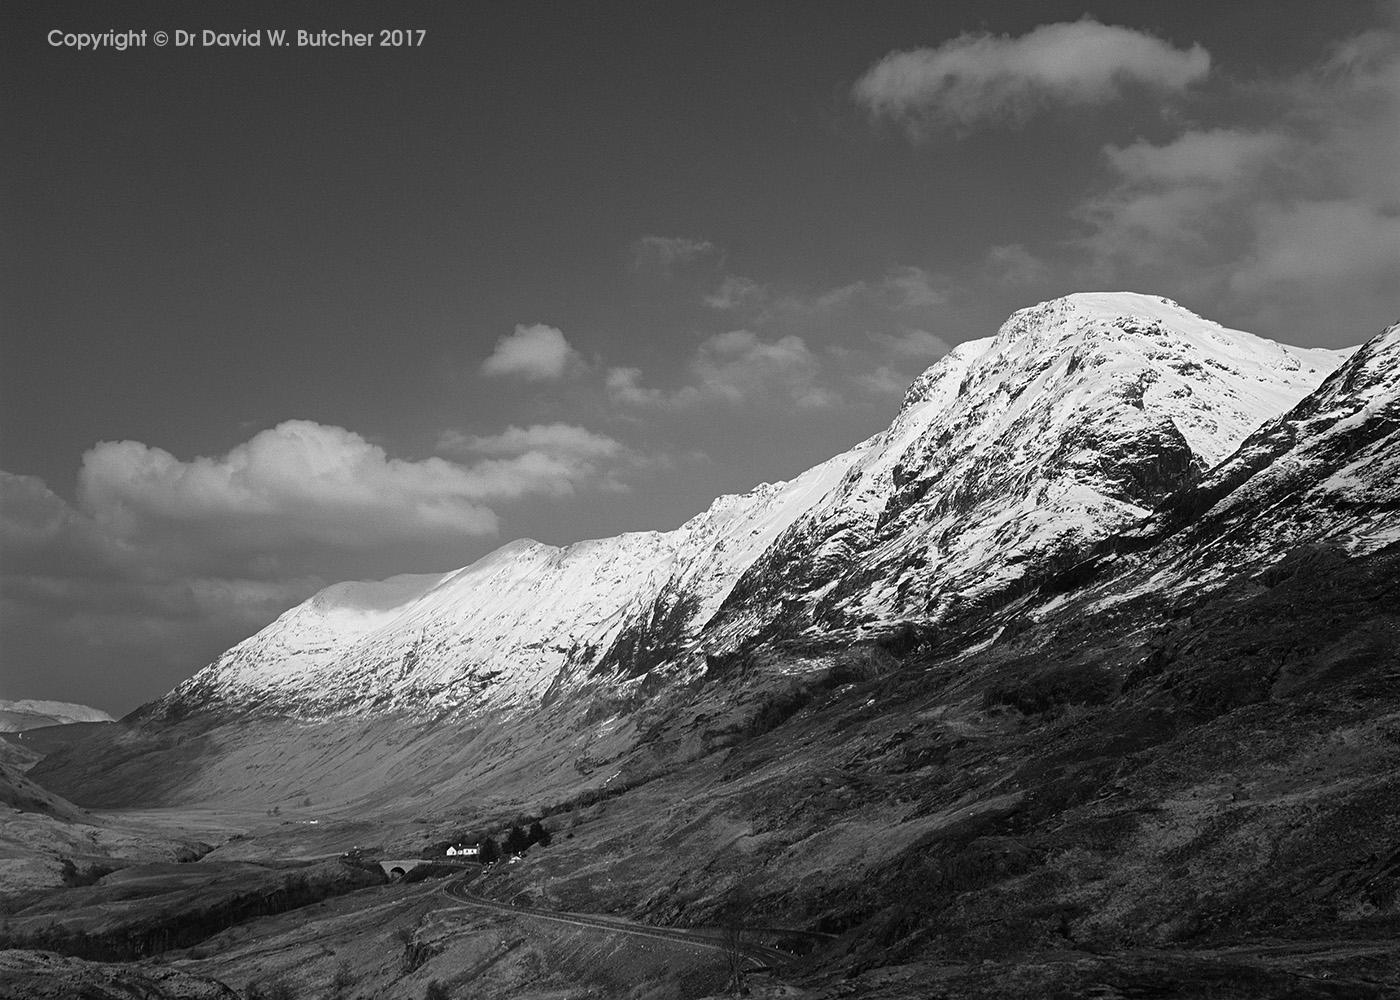 Aonach Eagach from Glen Coe, Scotland